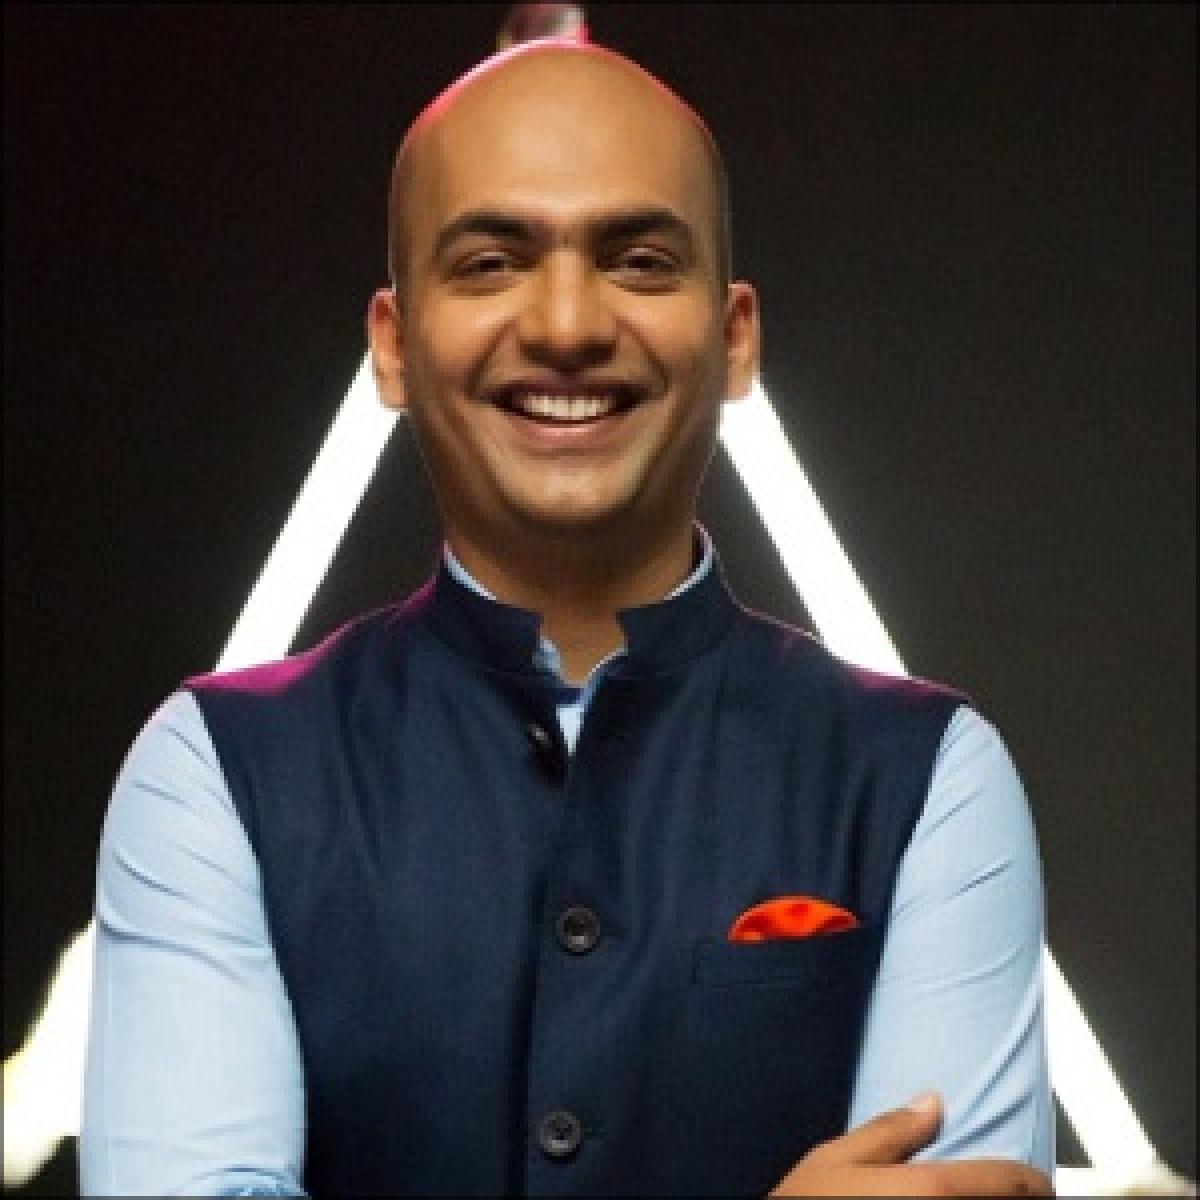 Lowe Lintas to handle Xiaomi India's creative duties